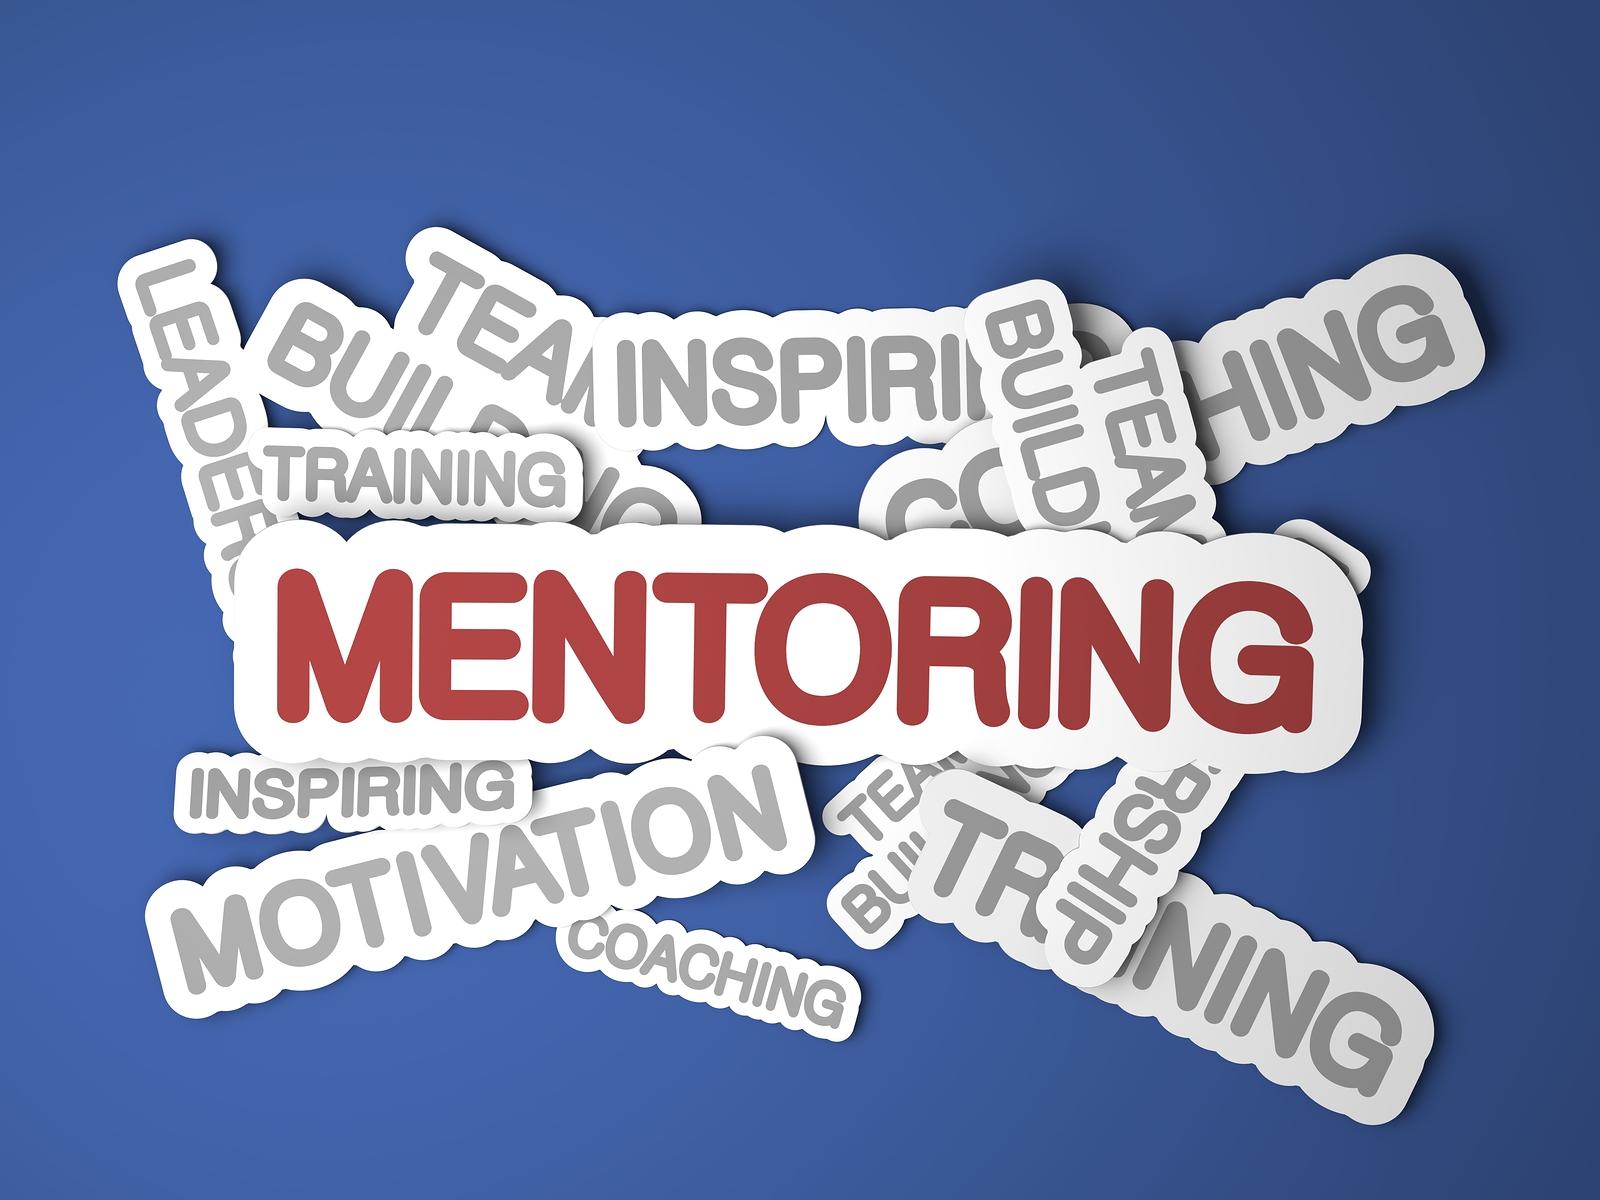 Business Mentoring